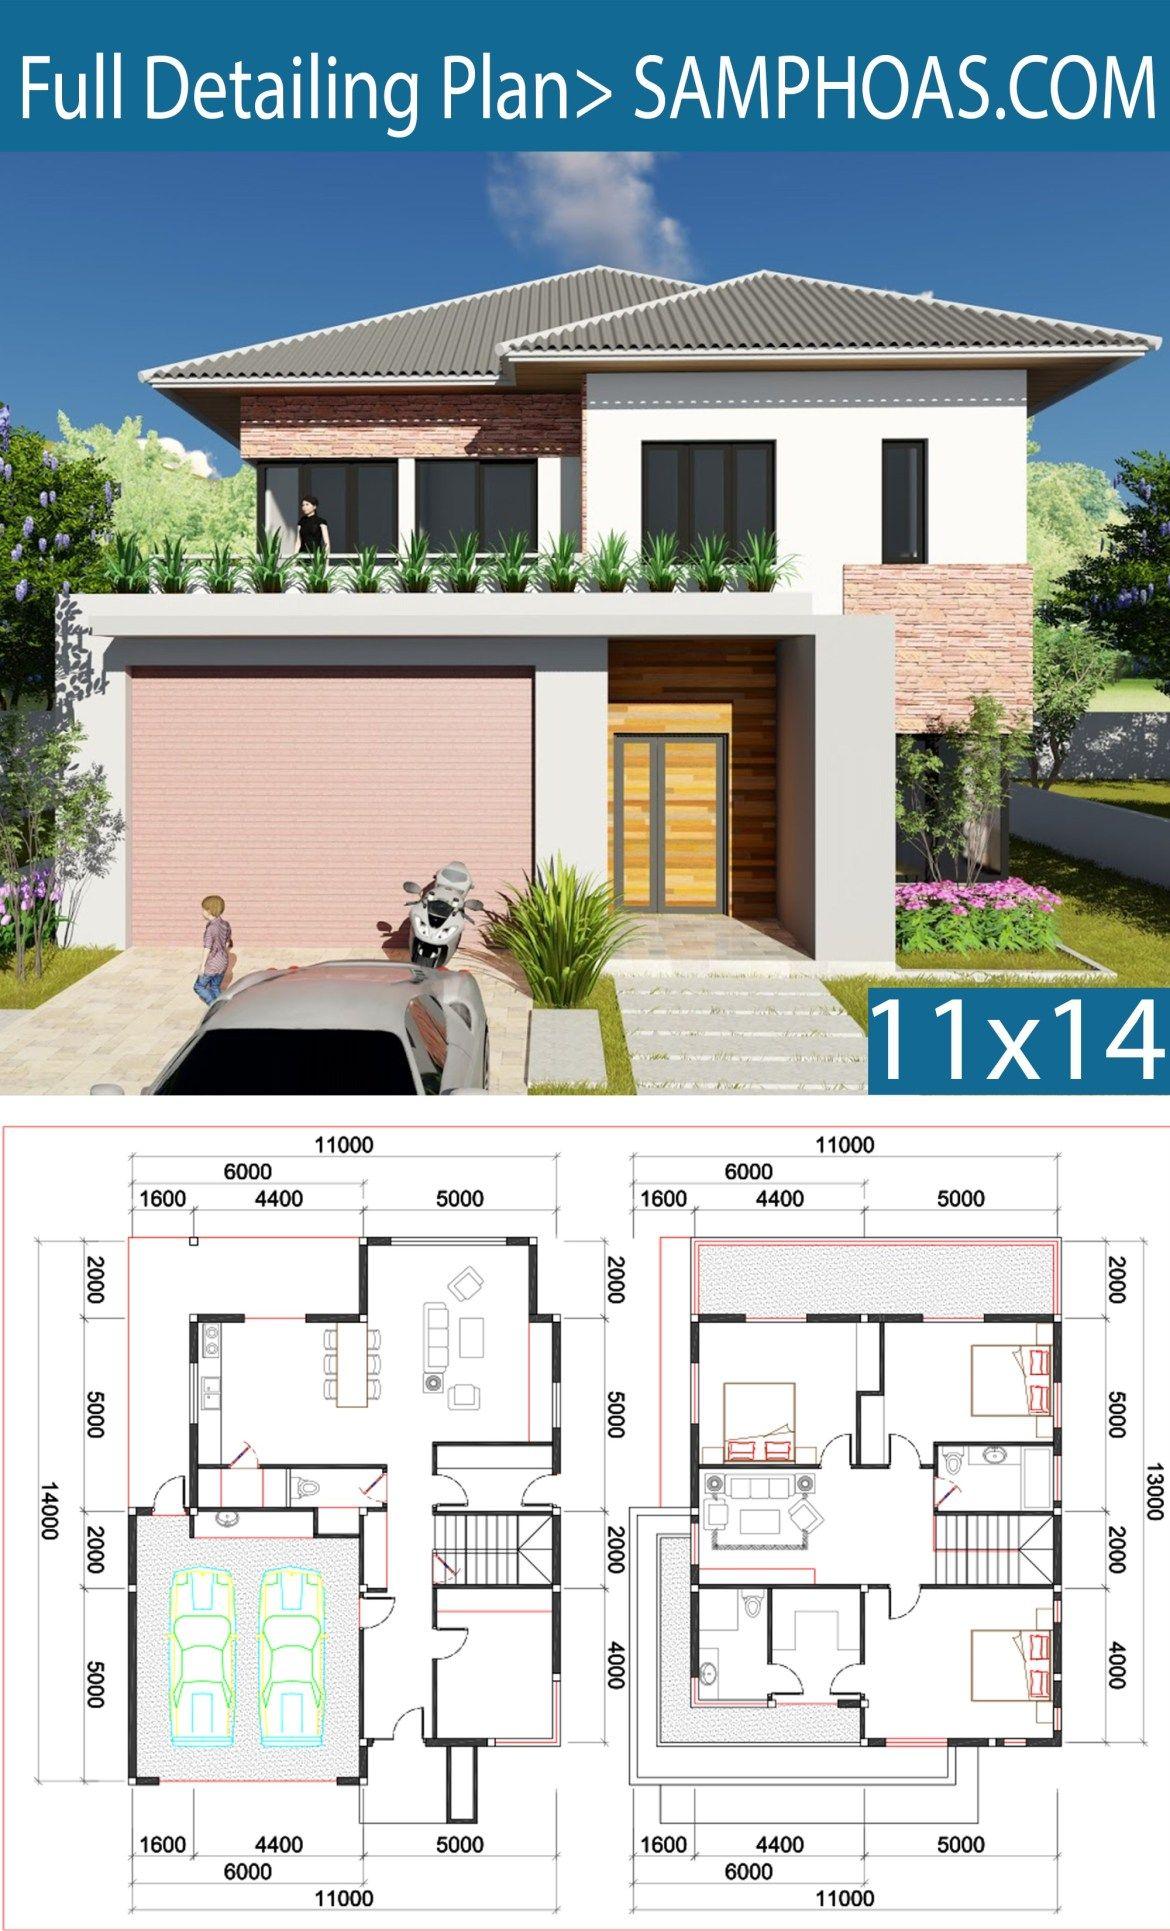 3 Bedroom Villa Design 11x13m Samphoas Plansearch Villa Design House Architecture Design Small House Layout